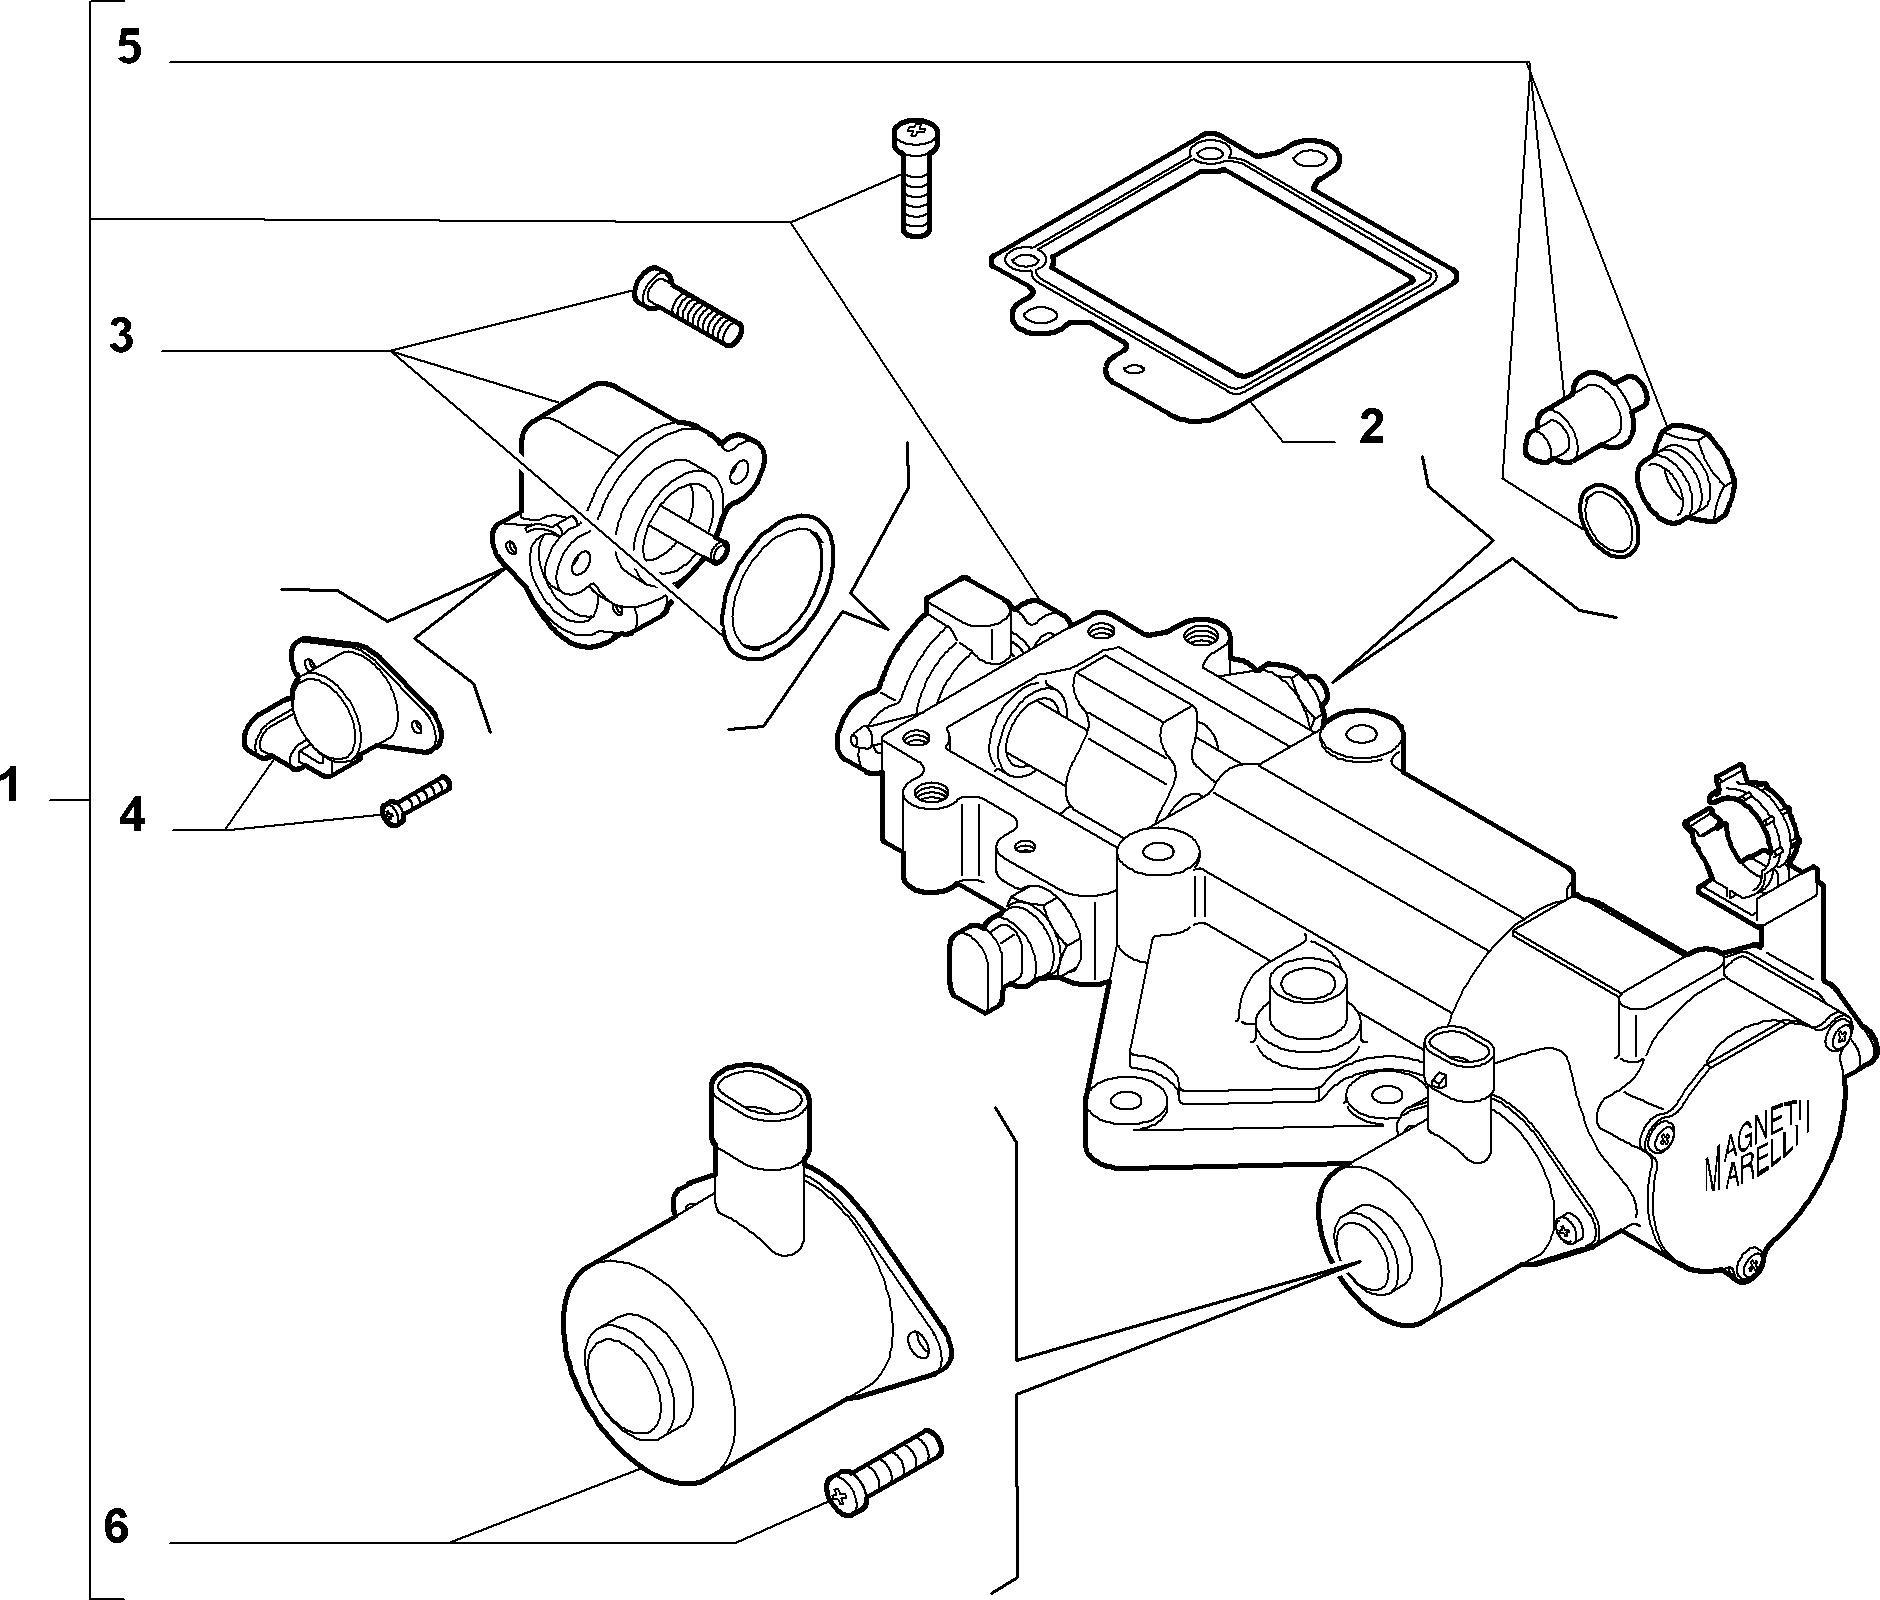 21200-050 GEARBOX CONTROL MODULE, POWER UNIT/ELECTRIC PUMP